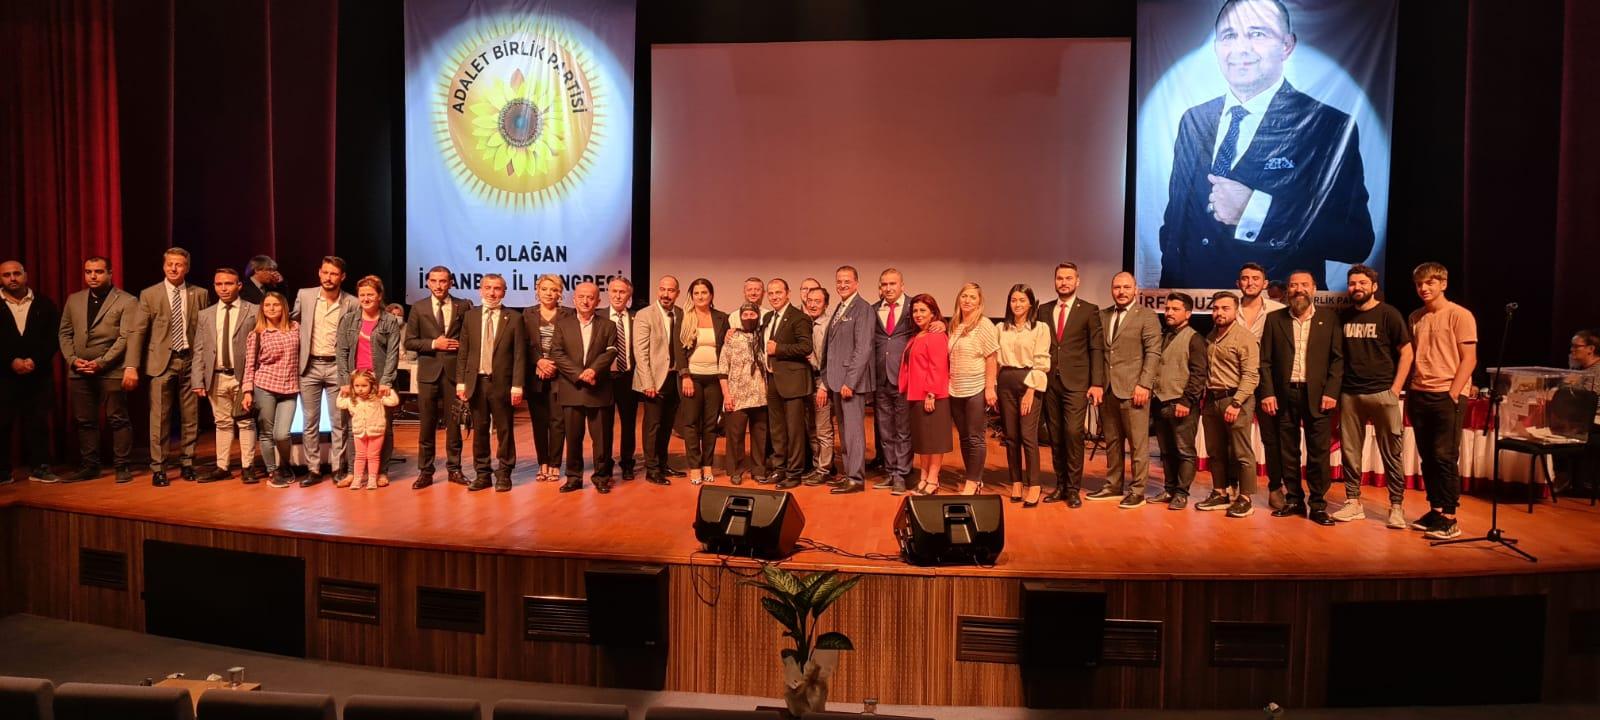 istanbul 1 olağan il kongresi